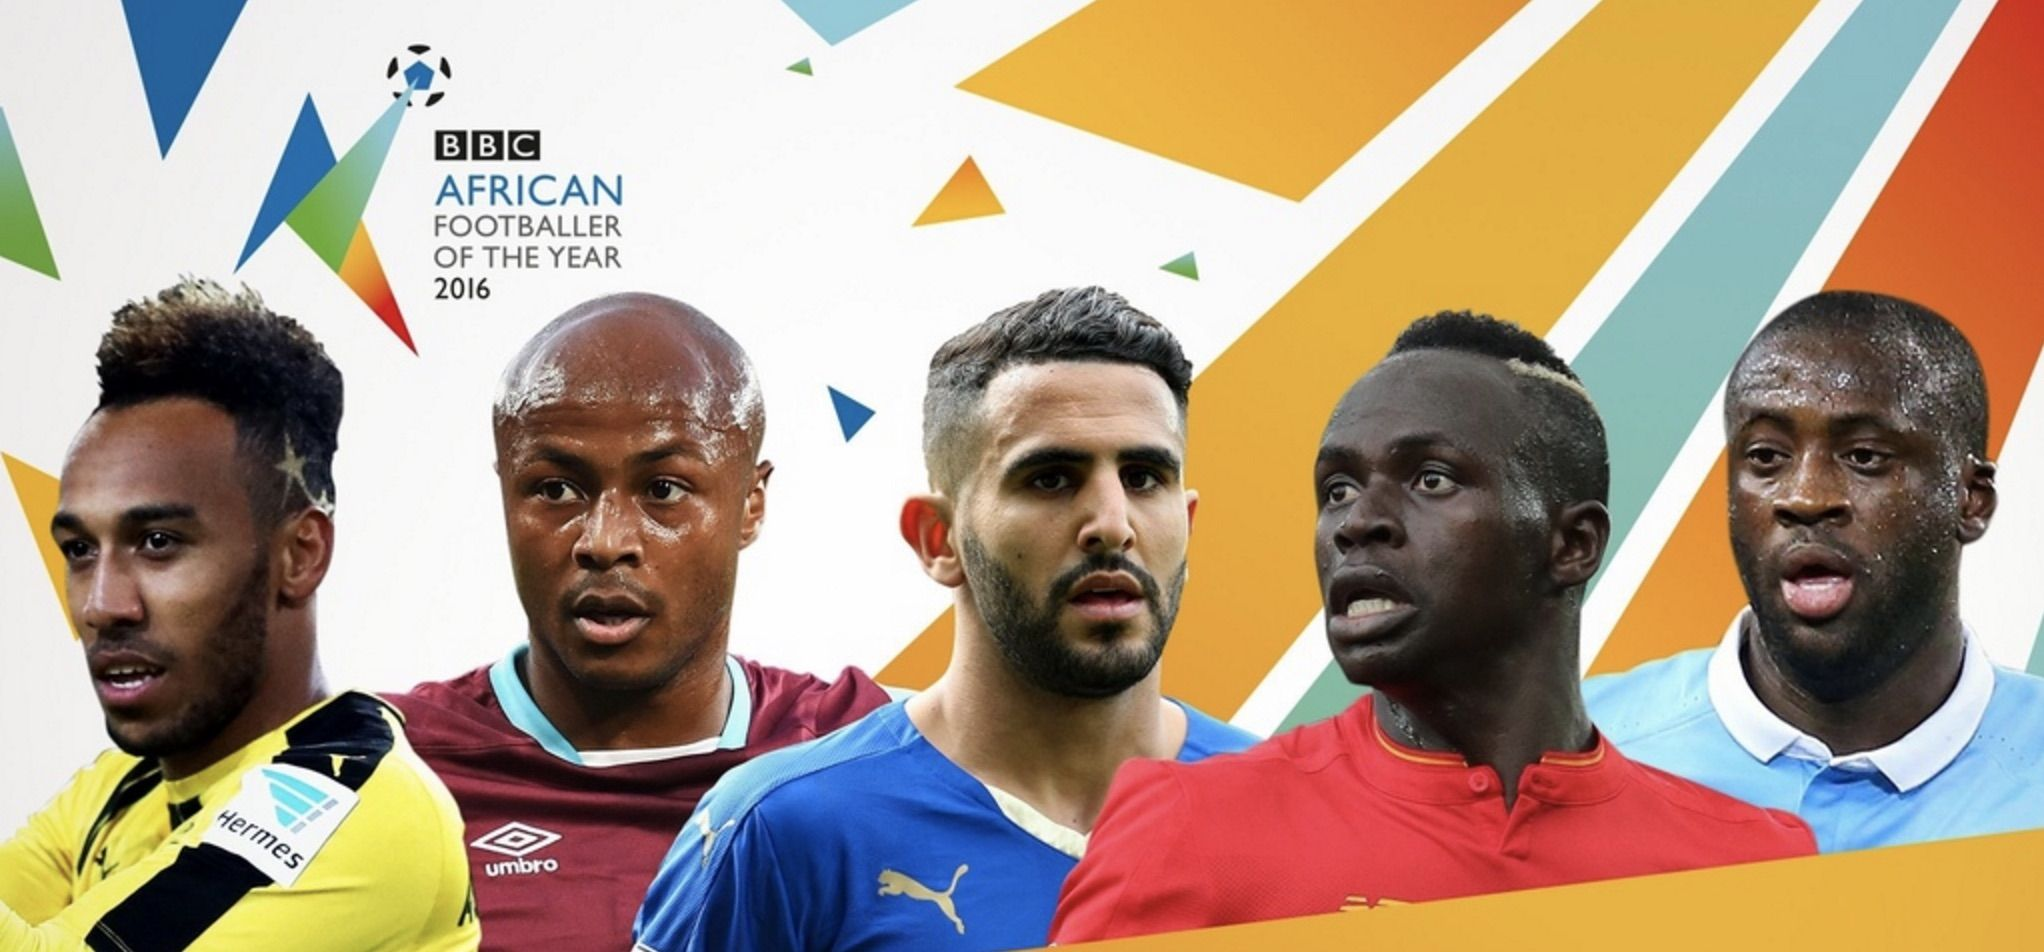 bbc-african-footballer-of-the-year-award-2016